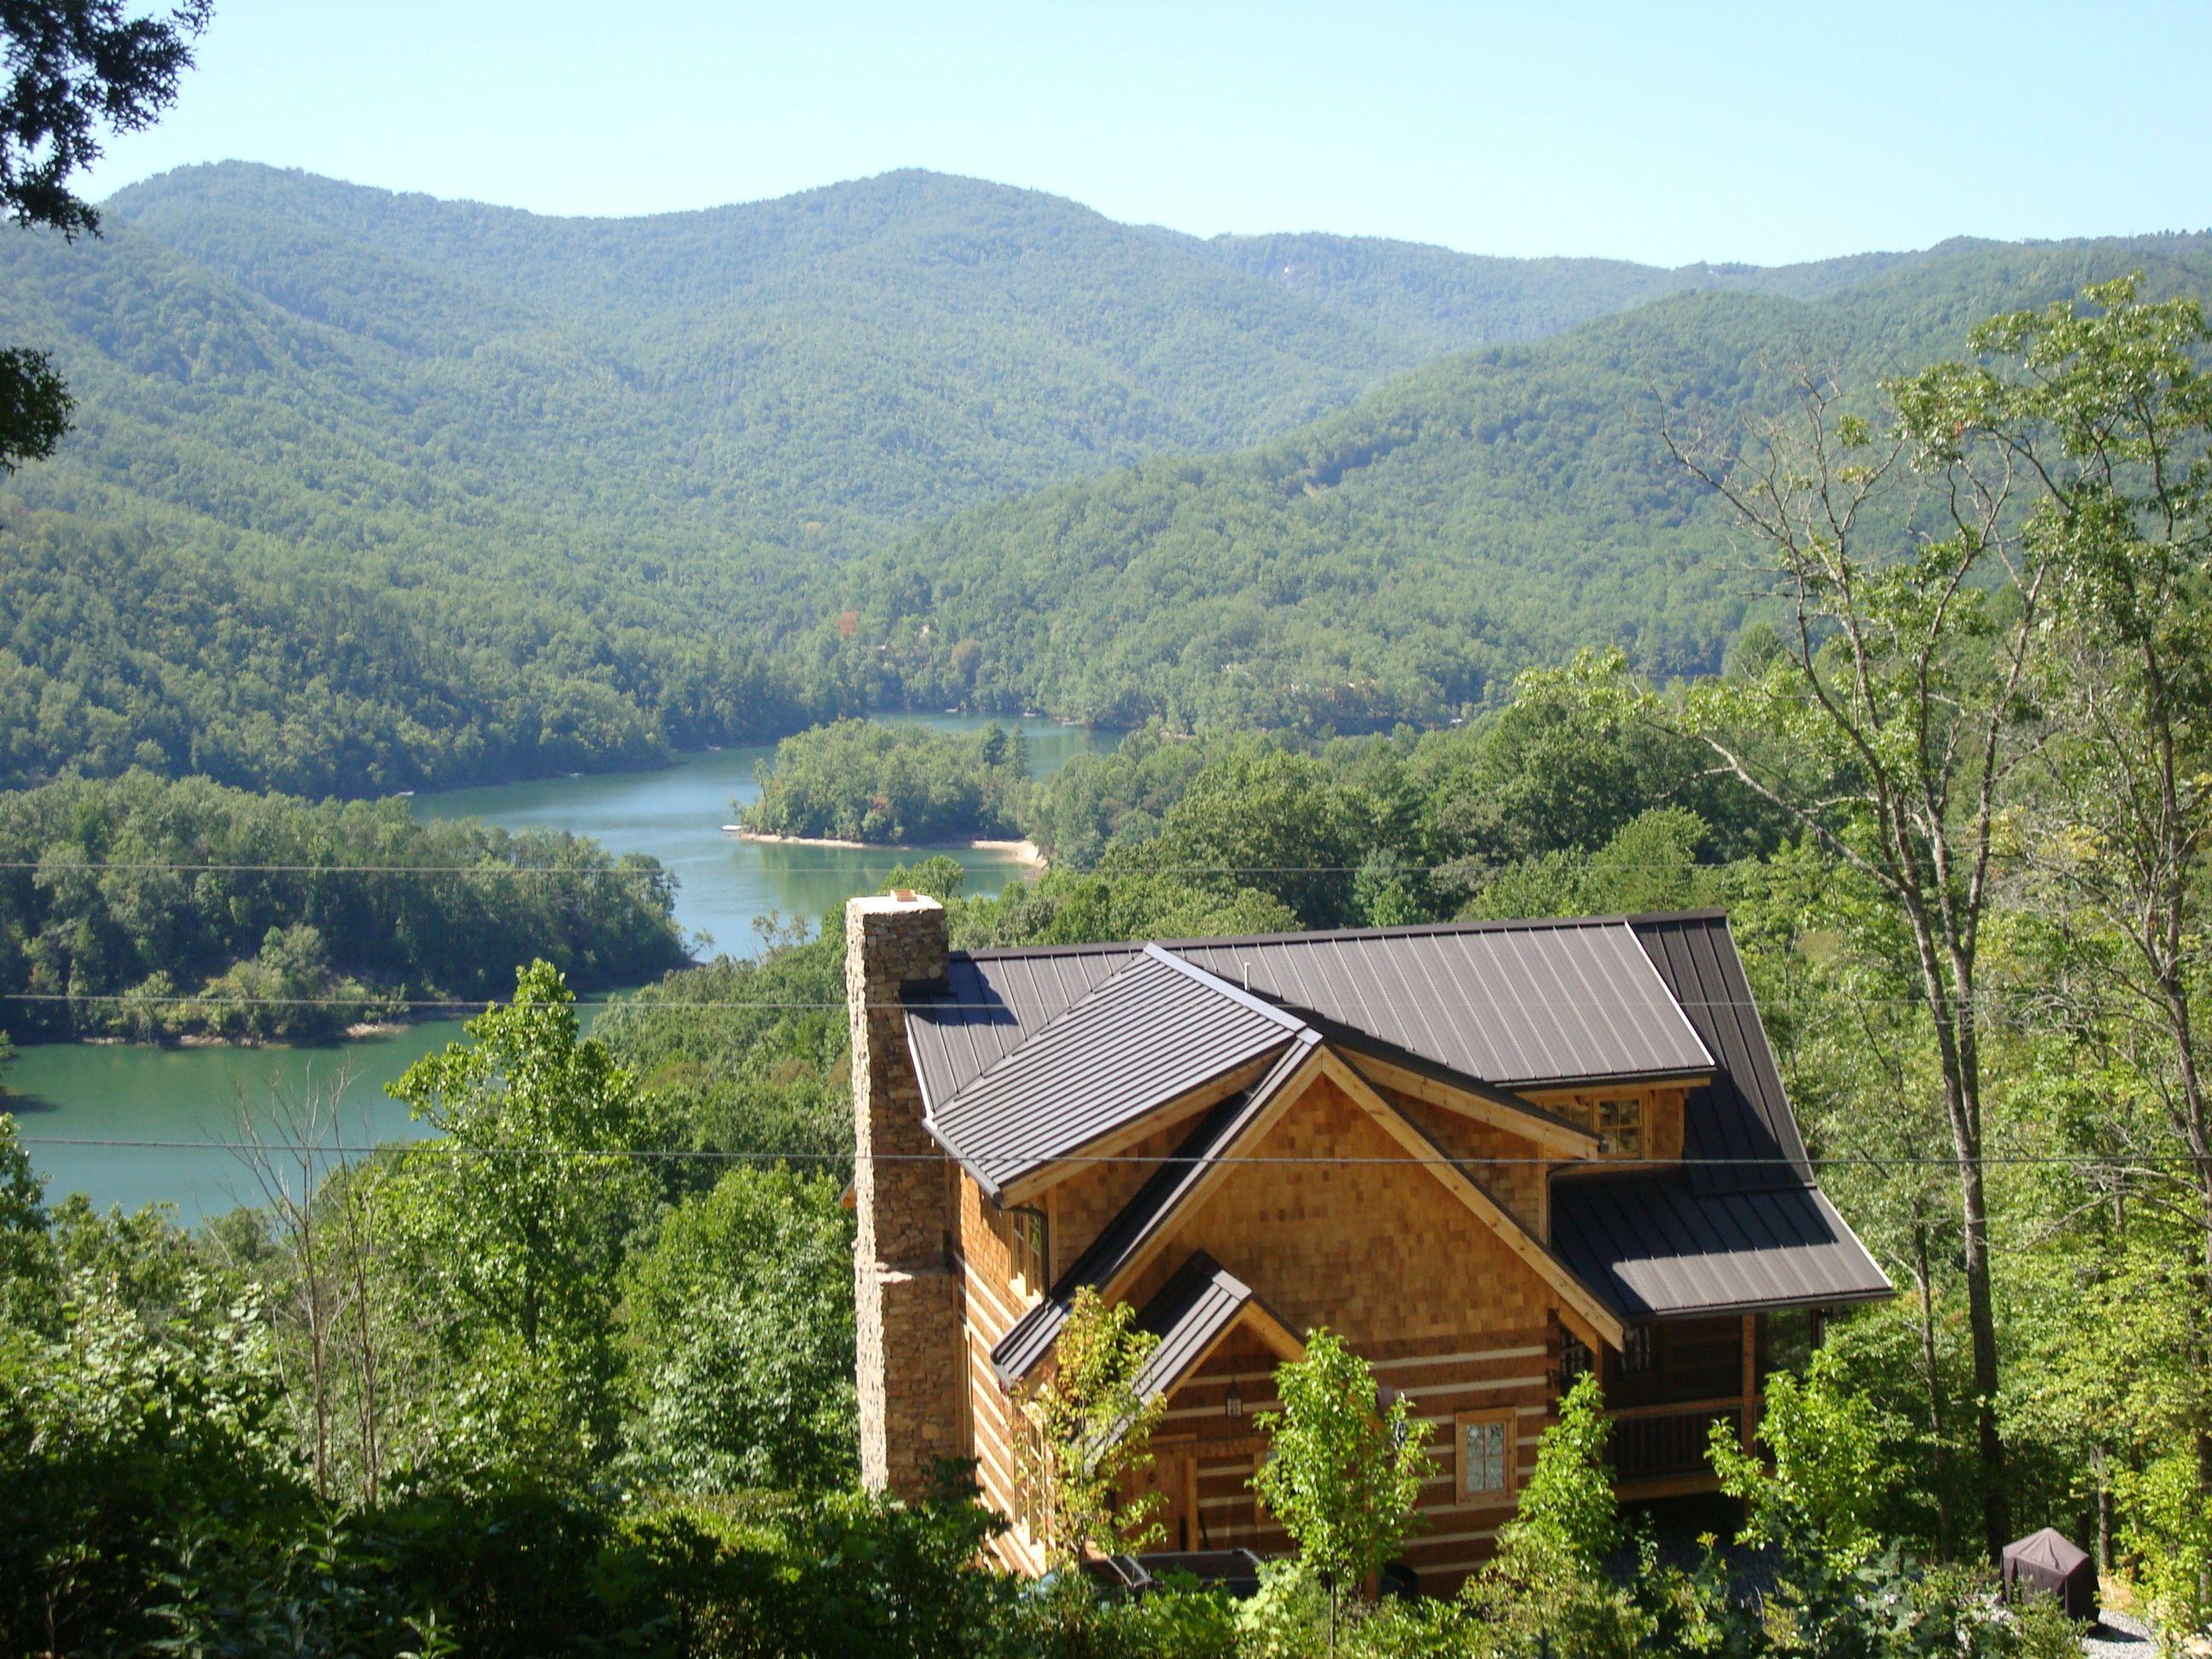 Log cabin on a lake royalty free stock photography image 7866317 - Log Cabin Overlooking Lake